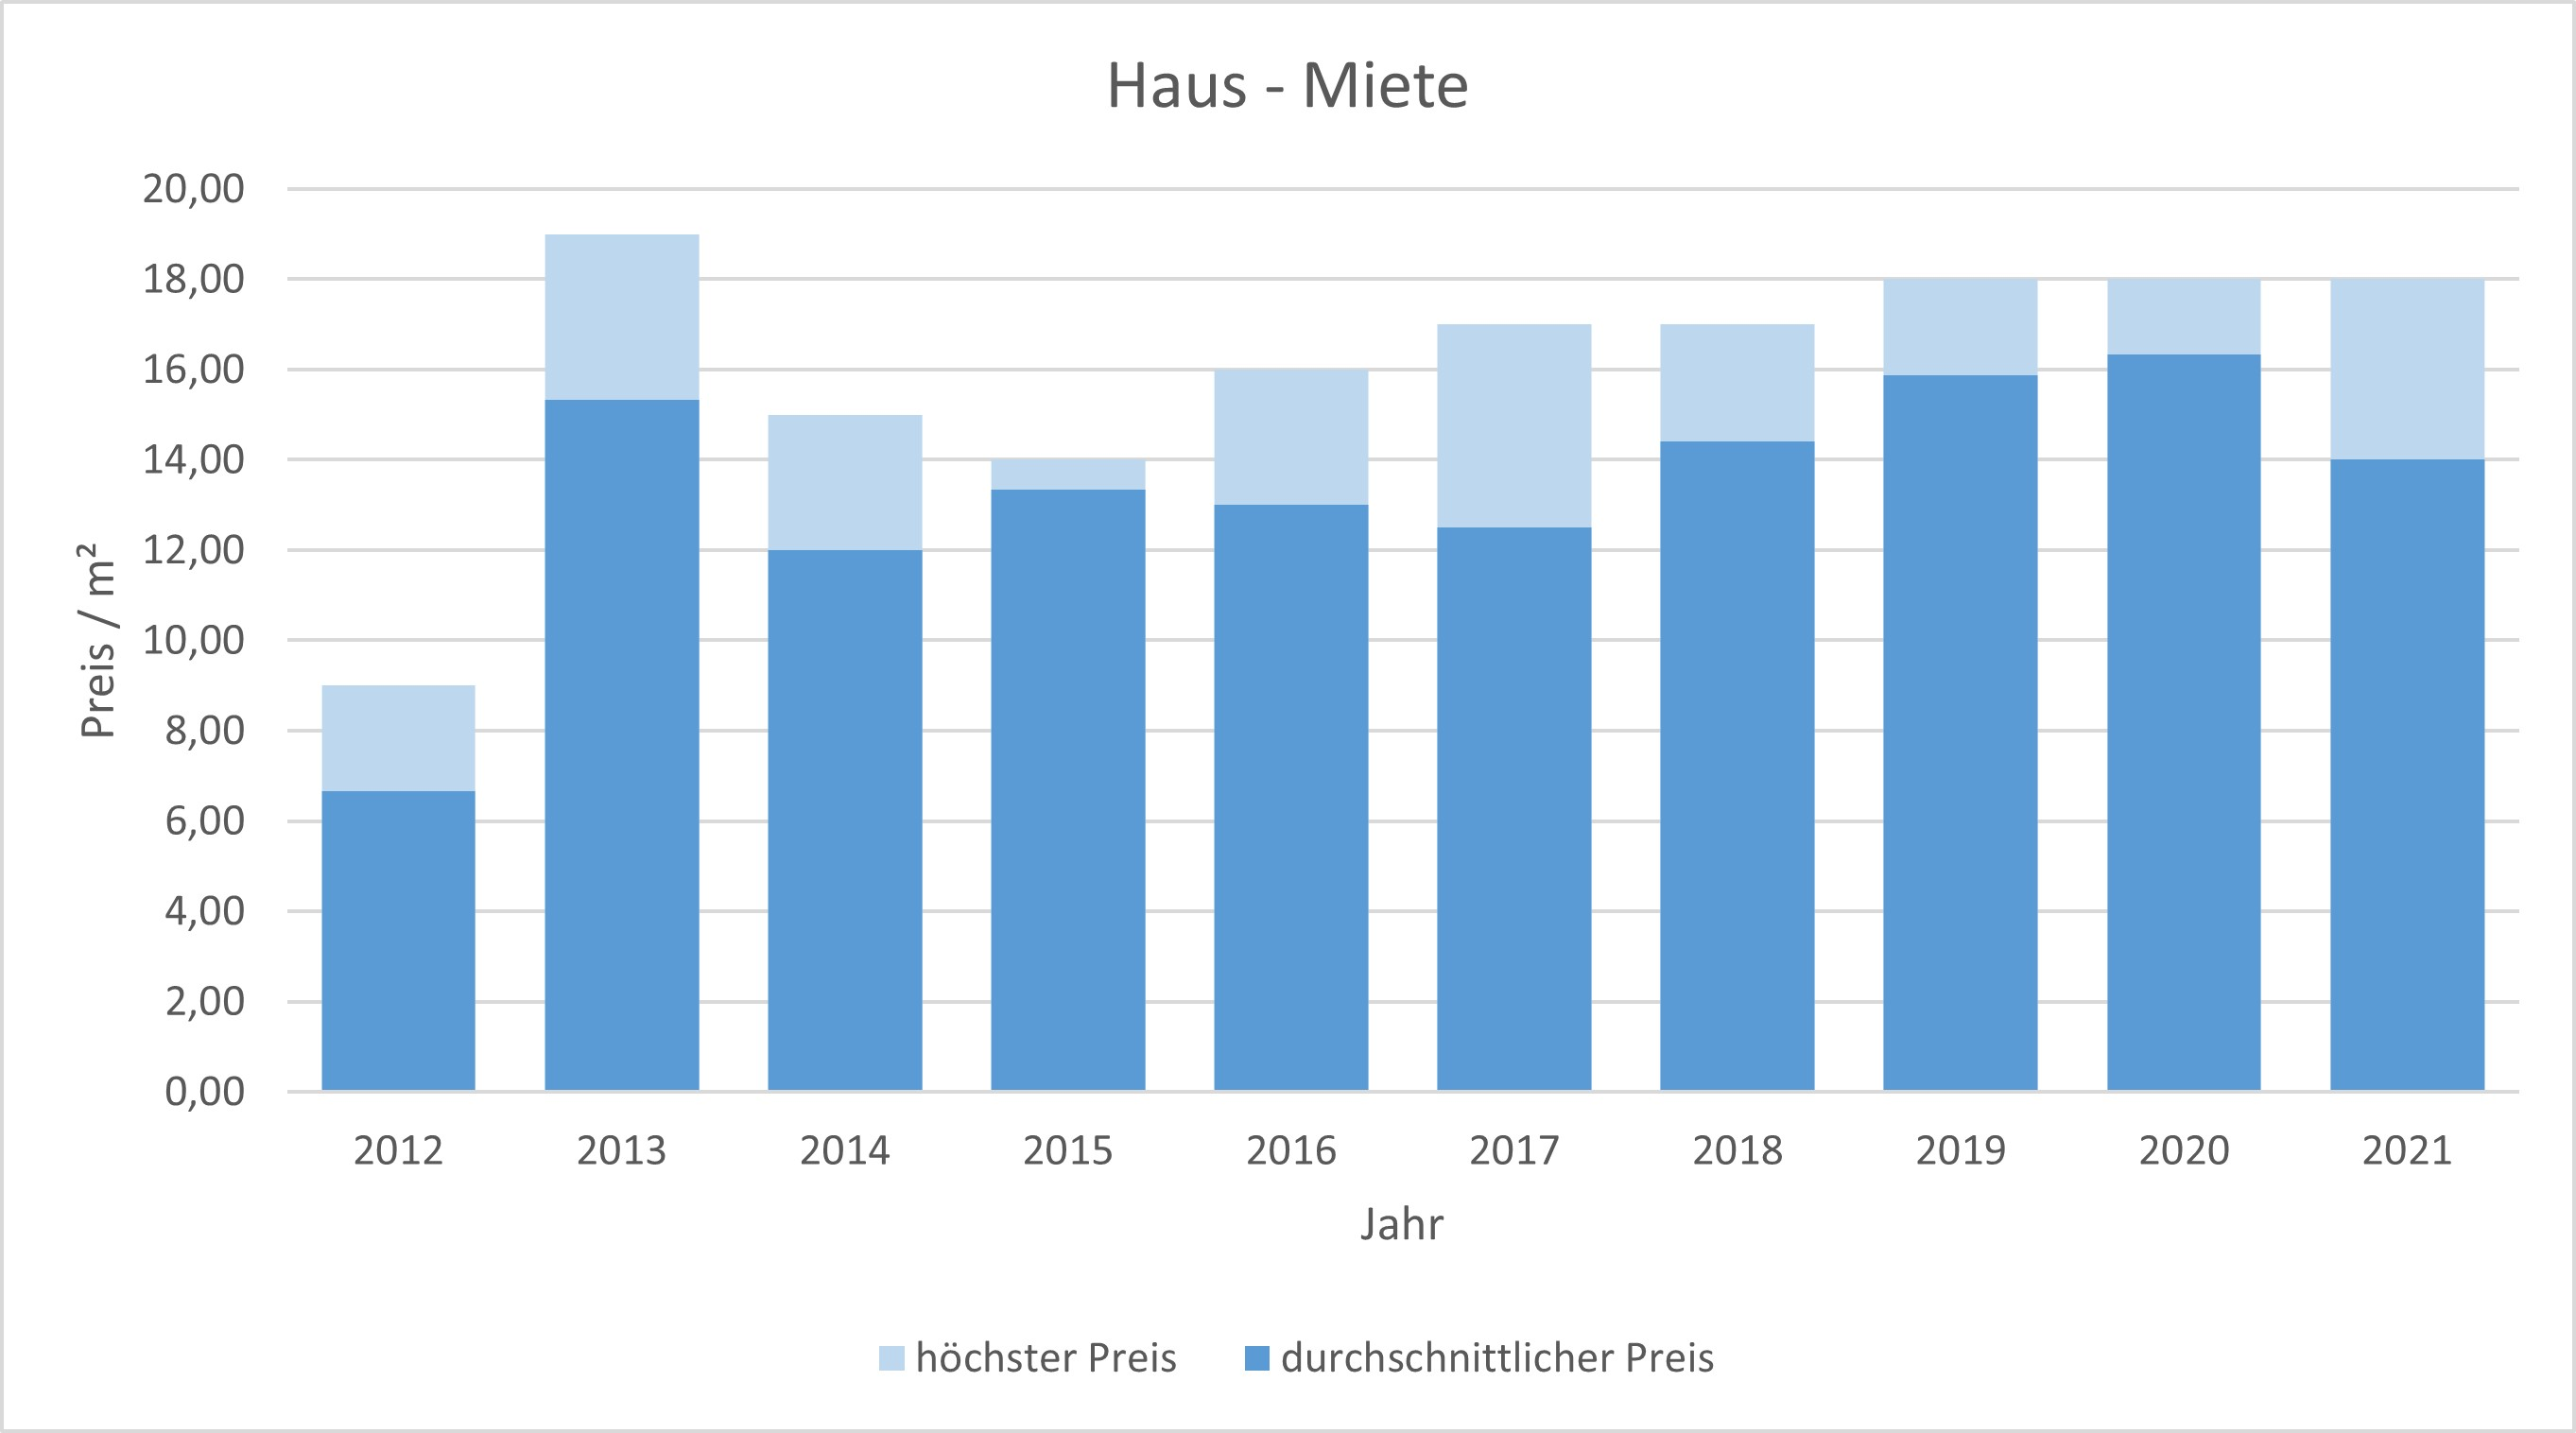 München - Landwied Haus mieten vermieten Preis Bewertung Makler 2019 2020 2021  www.happy-immo.de